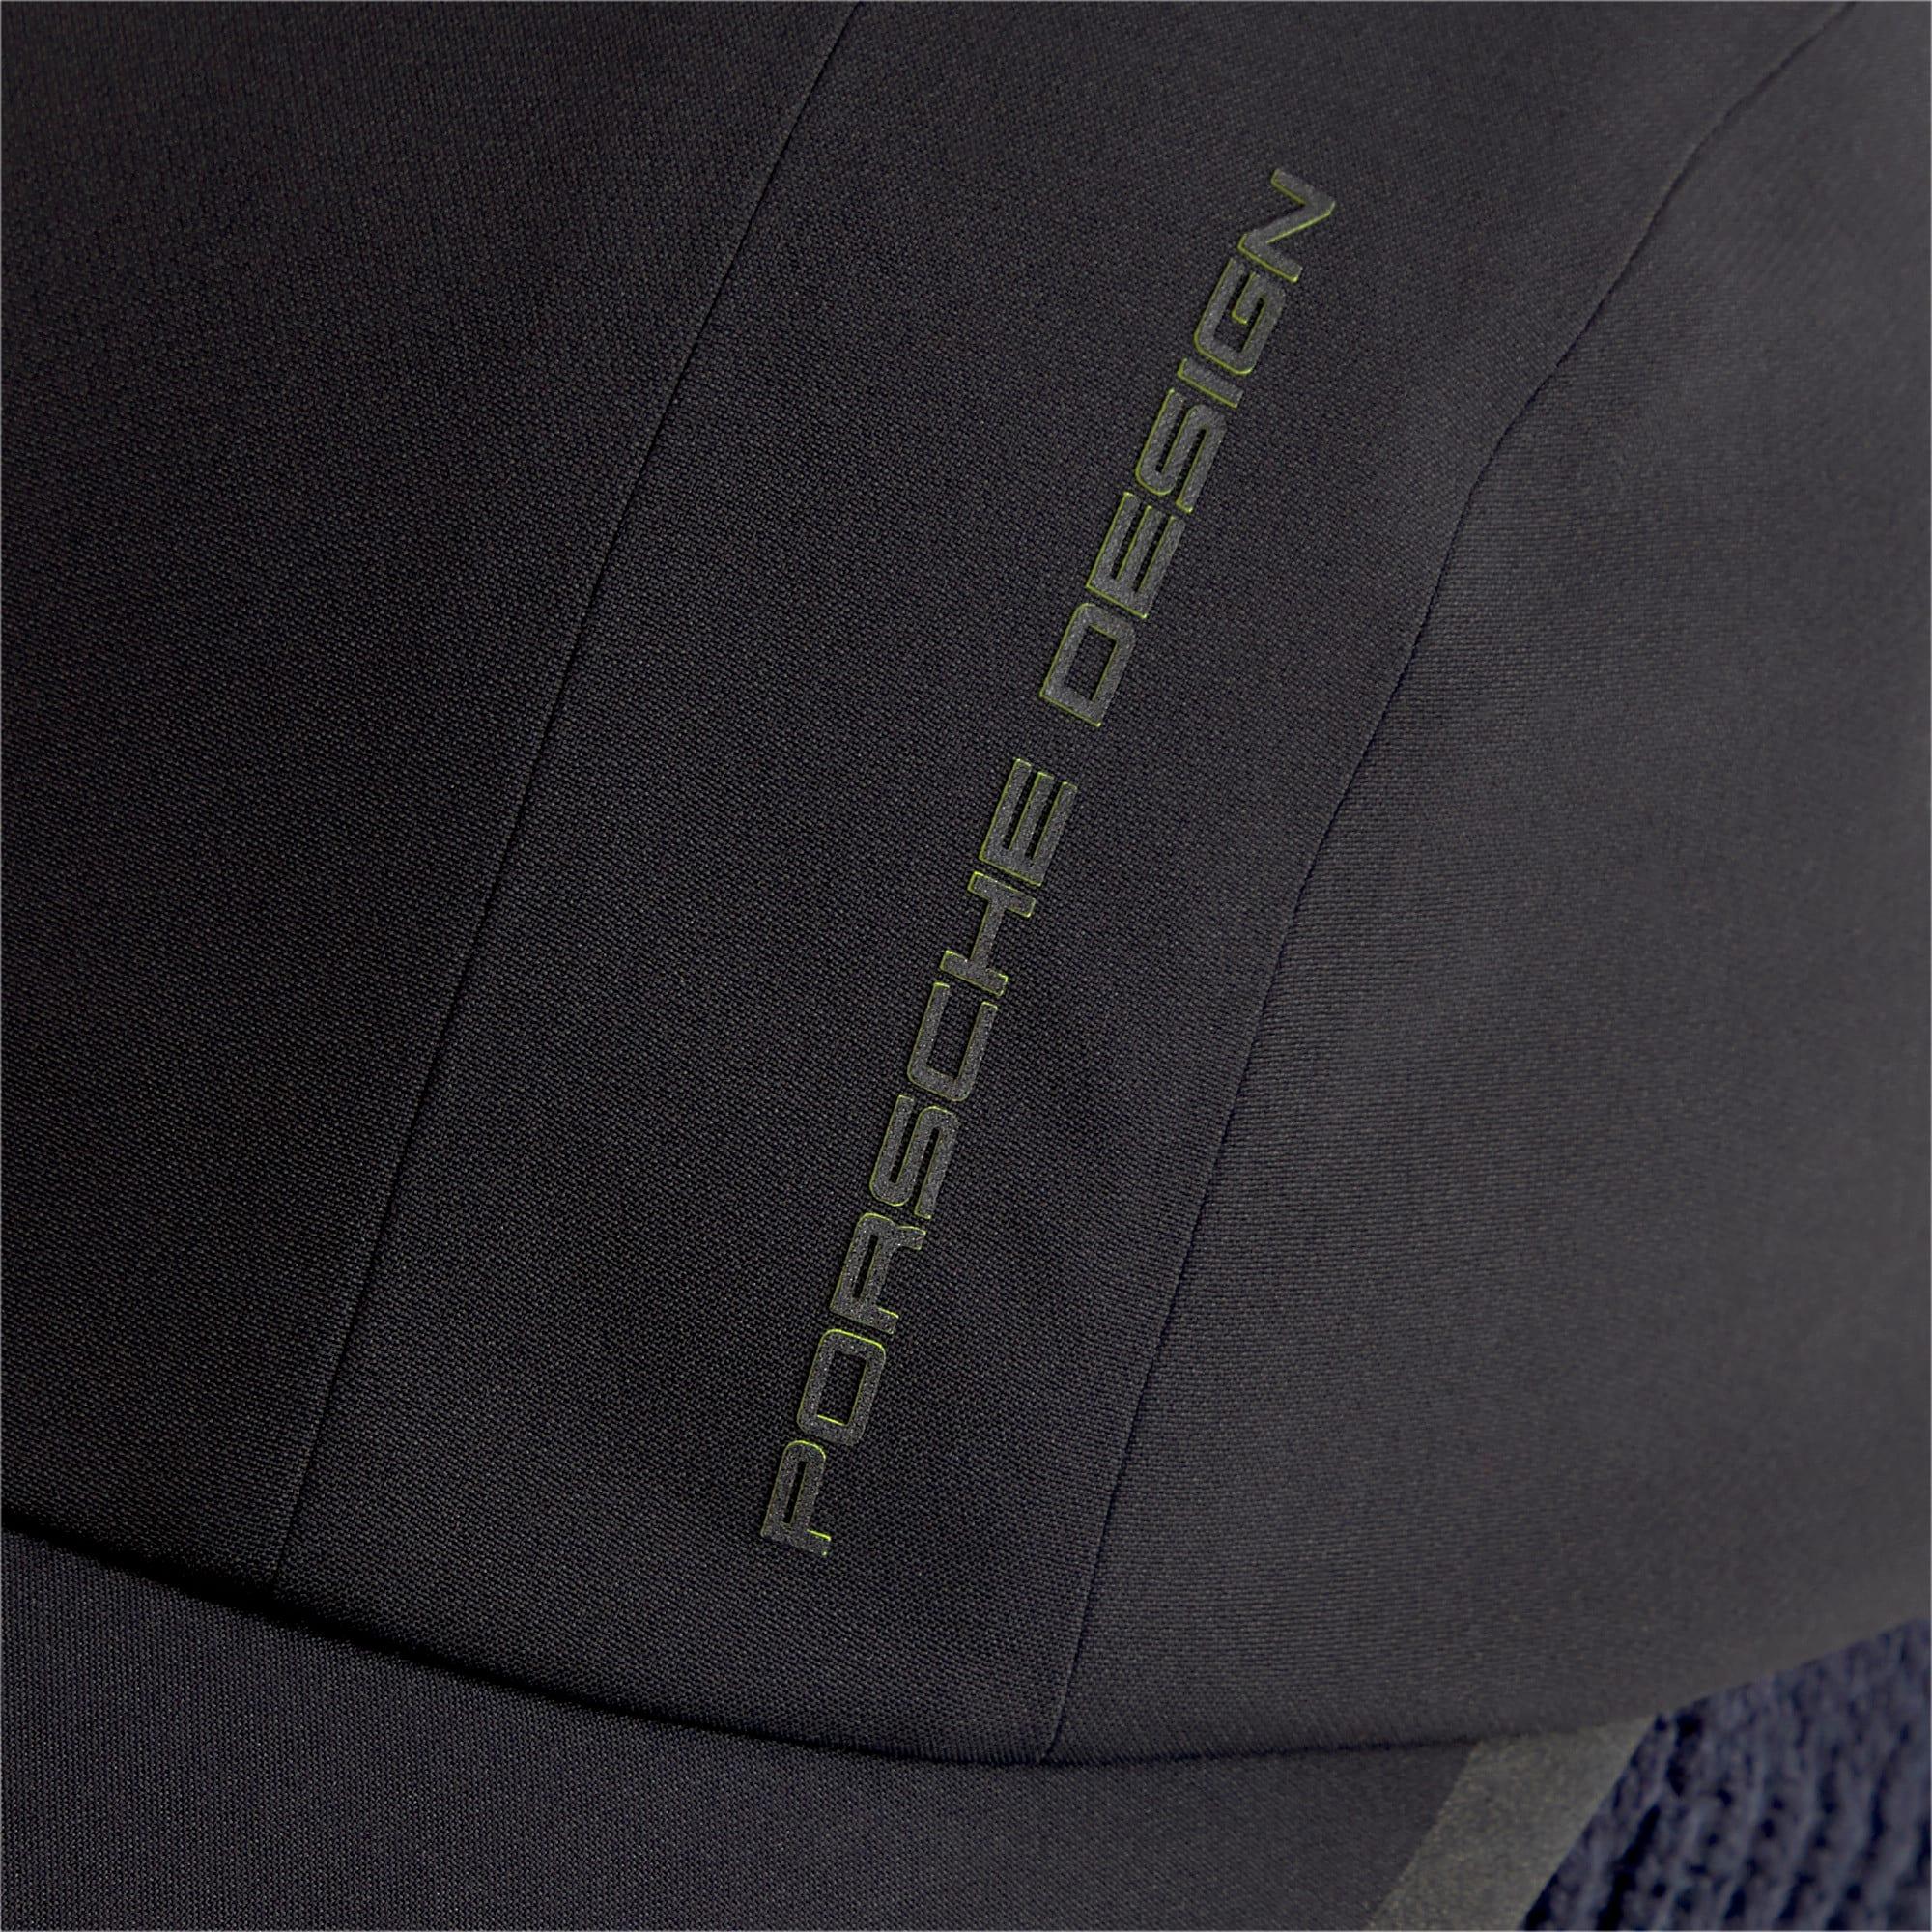 Thumbnail 4 of Porsche Design Winterized Cap, Puma Black, medium